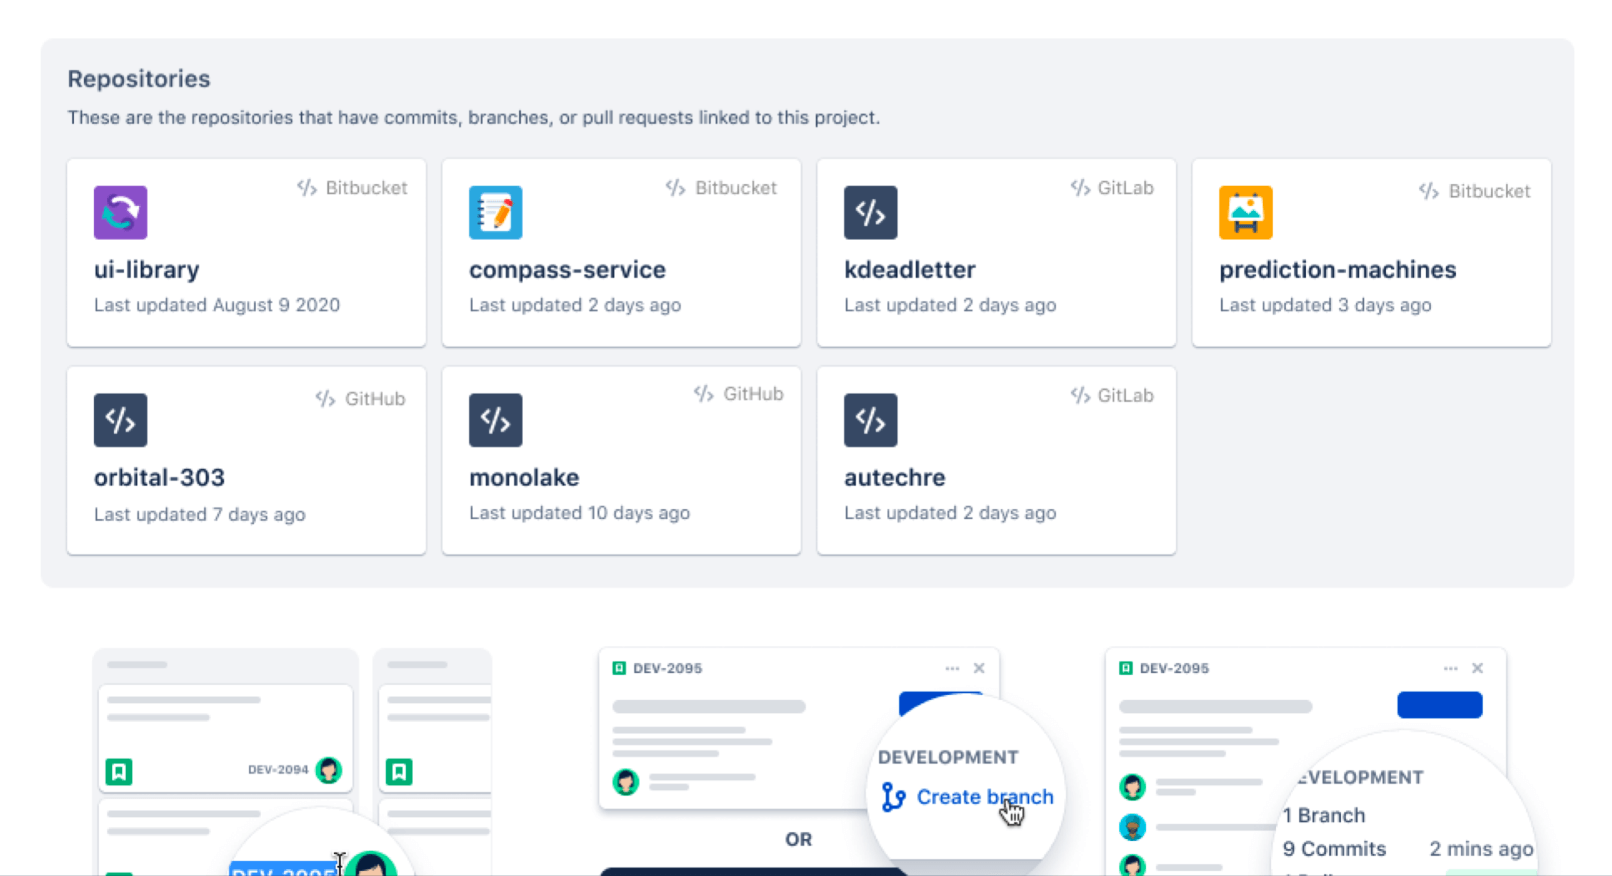 Repositories in Jira Software